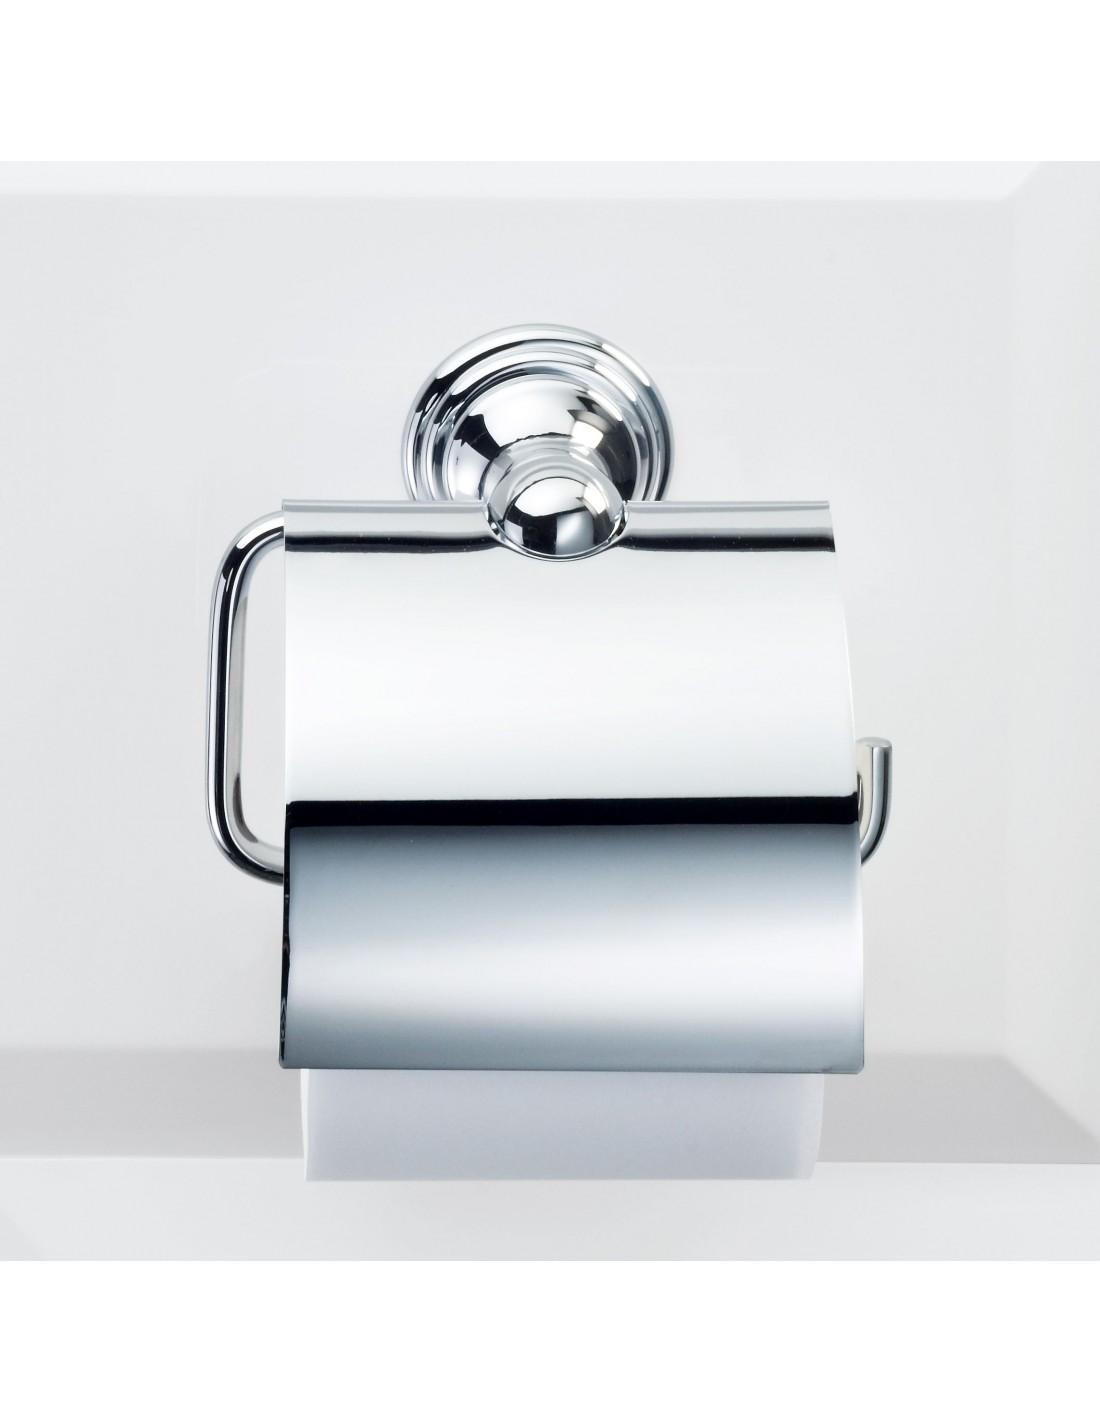 porte rouleau classic chrome Decor Walther